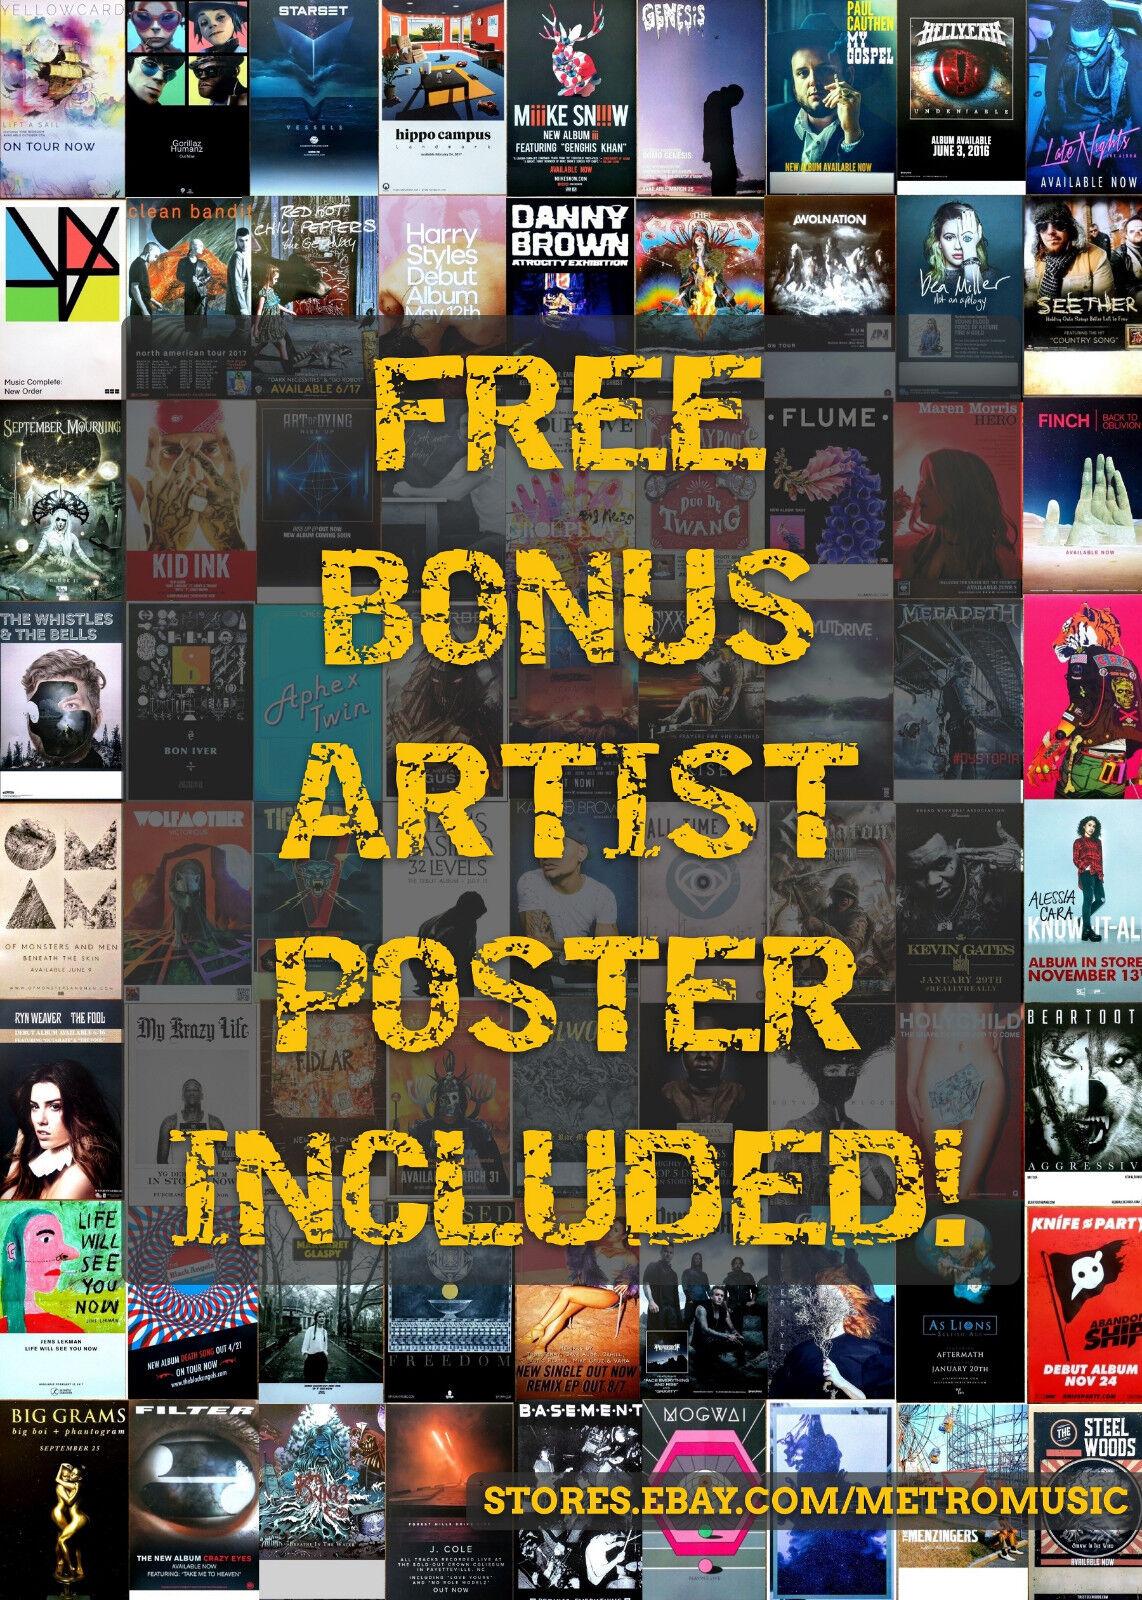 Kevin gates islah ltd ed discontinued new rare poster +free hip-hop rap poster!